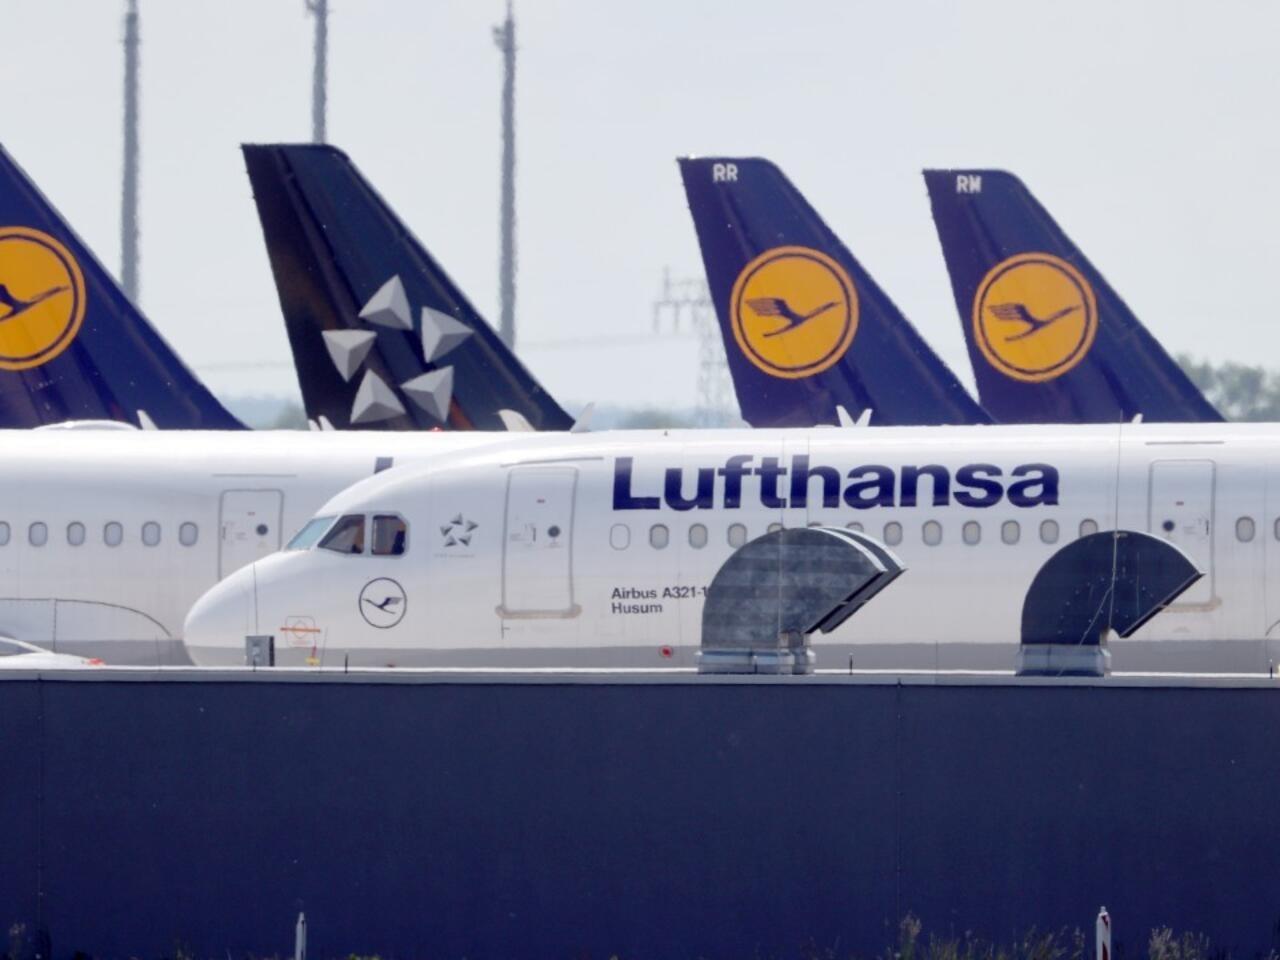 German airline Lufthansa to cut 22,000 jobs amid Covid-19 downturn